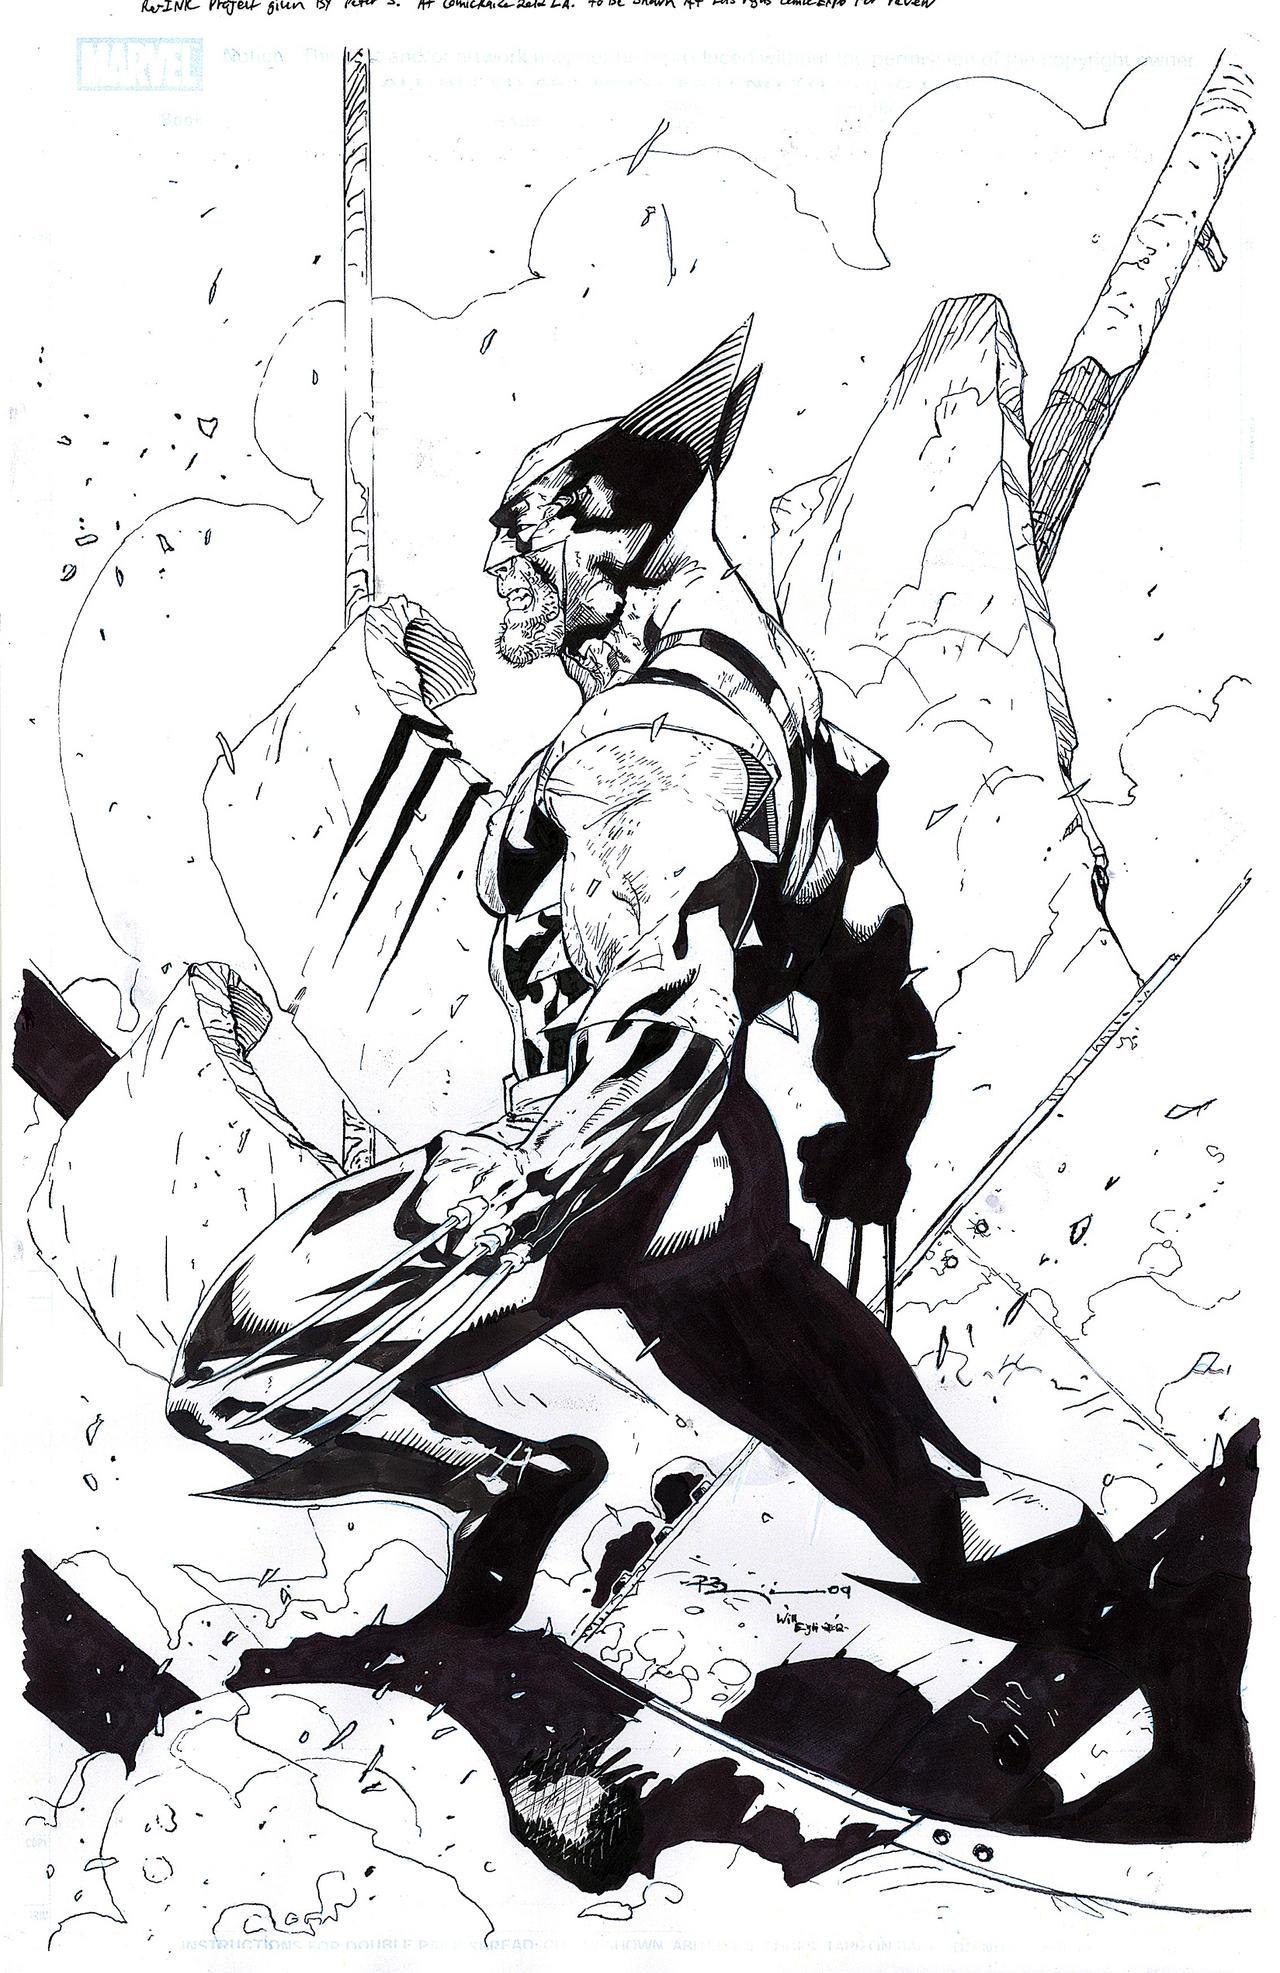 Wolverine Re-Ink take 2 - Benjamin - Egli by SurfTiki